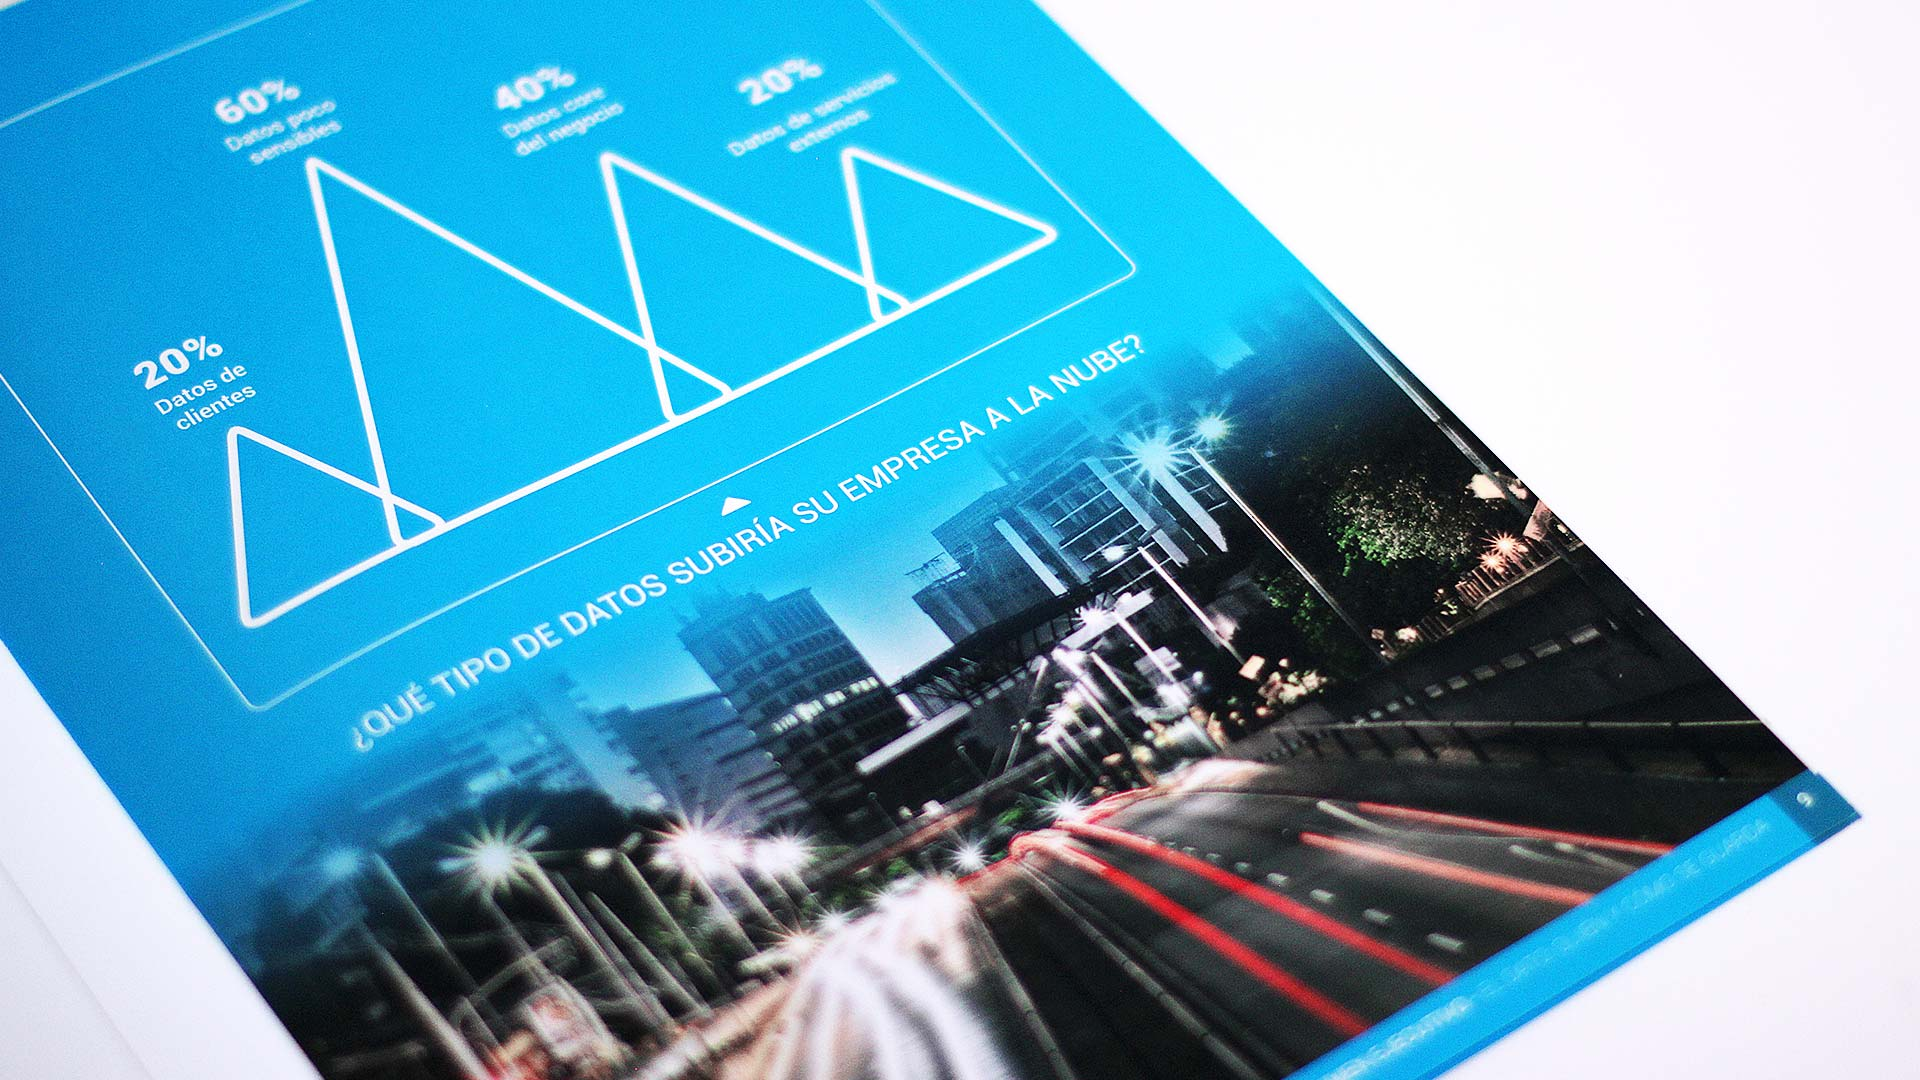 netapp-mediacloud-content-marketing-informe-resumen-ejecutivo-ebook-2017-17